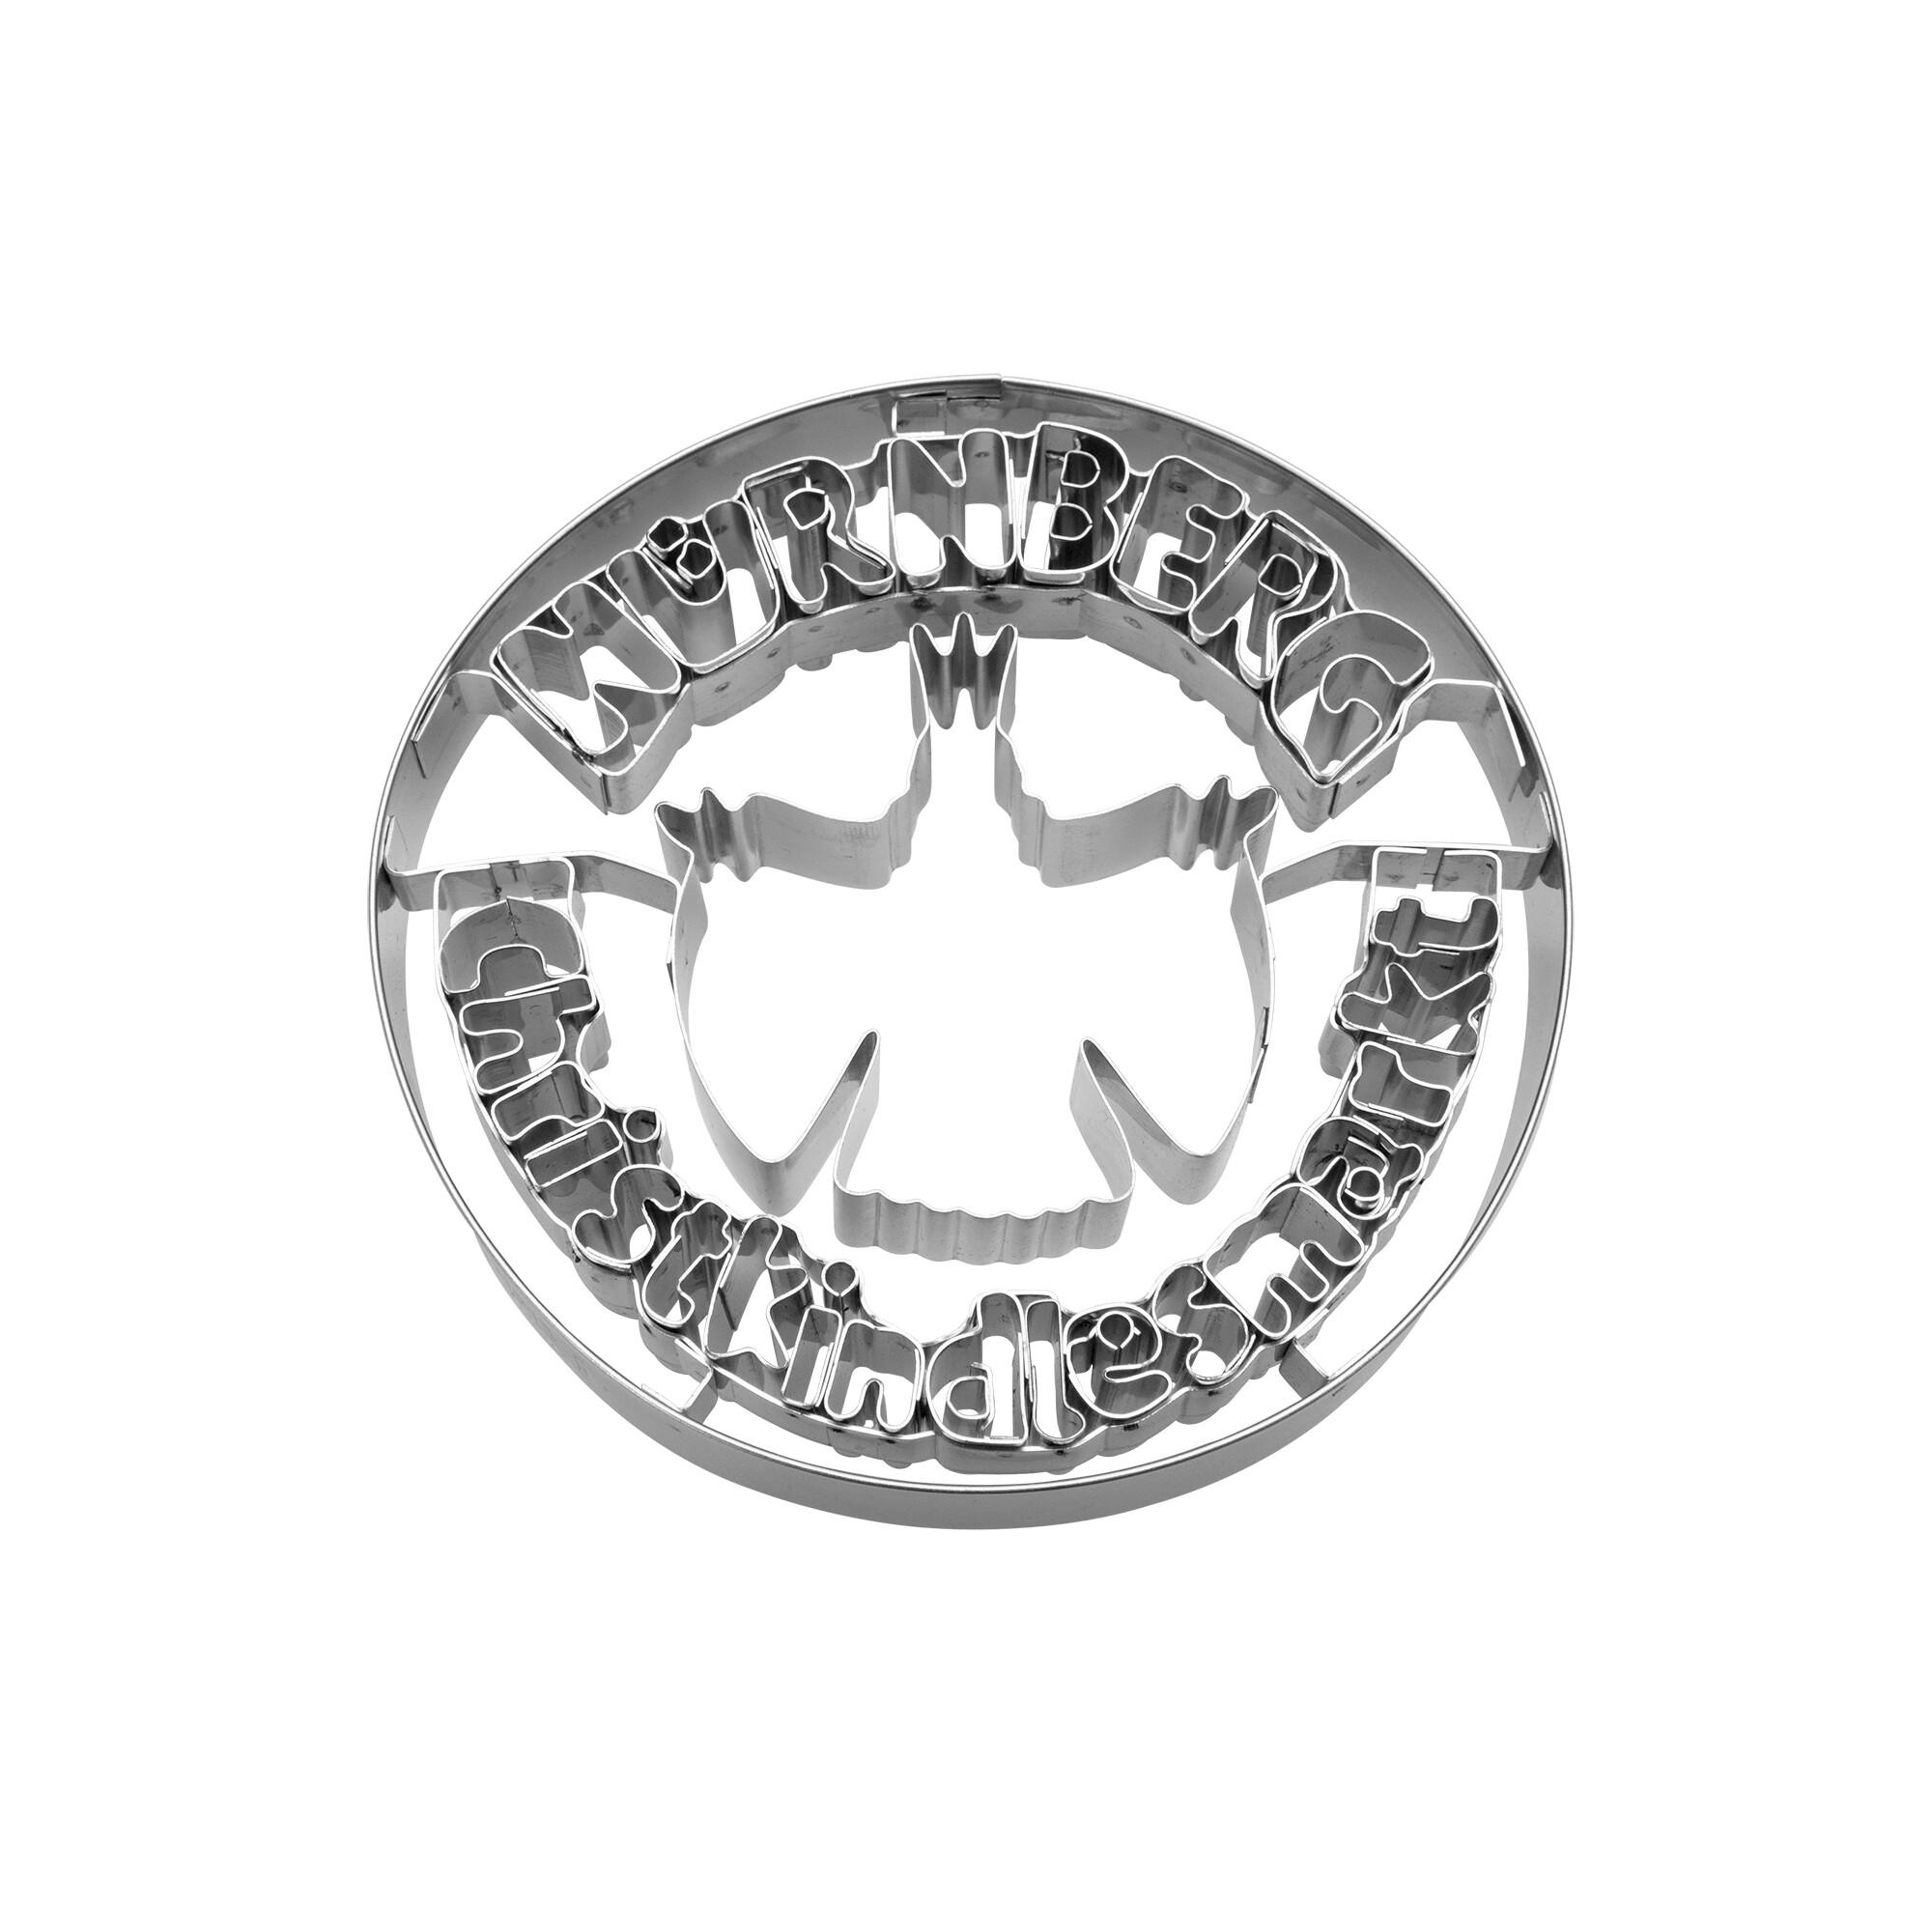 Präge-Ausstecher - Nürnberg Christkindlesmarkt®